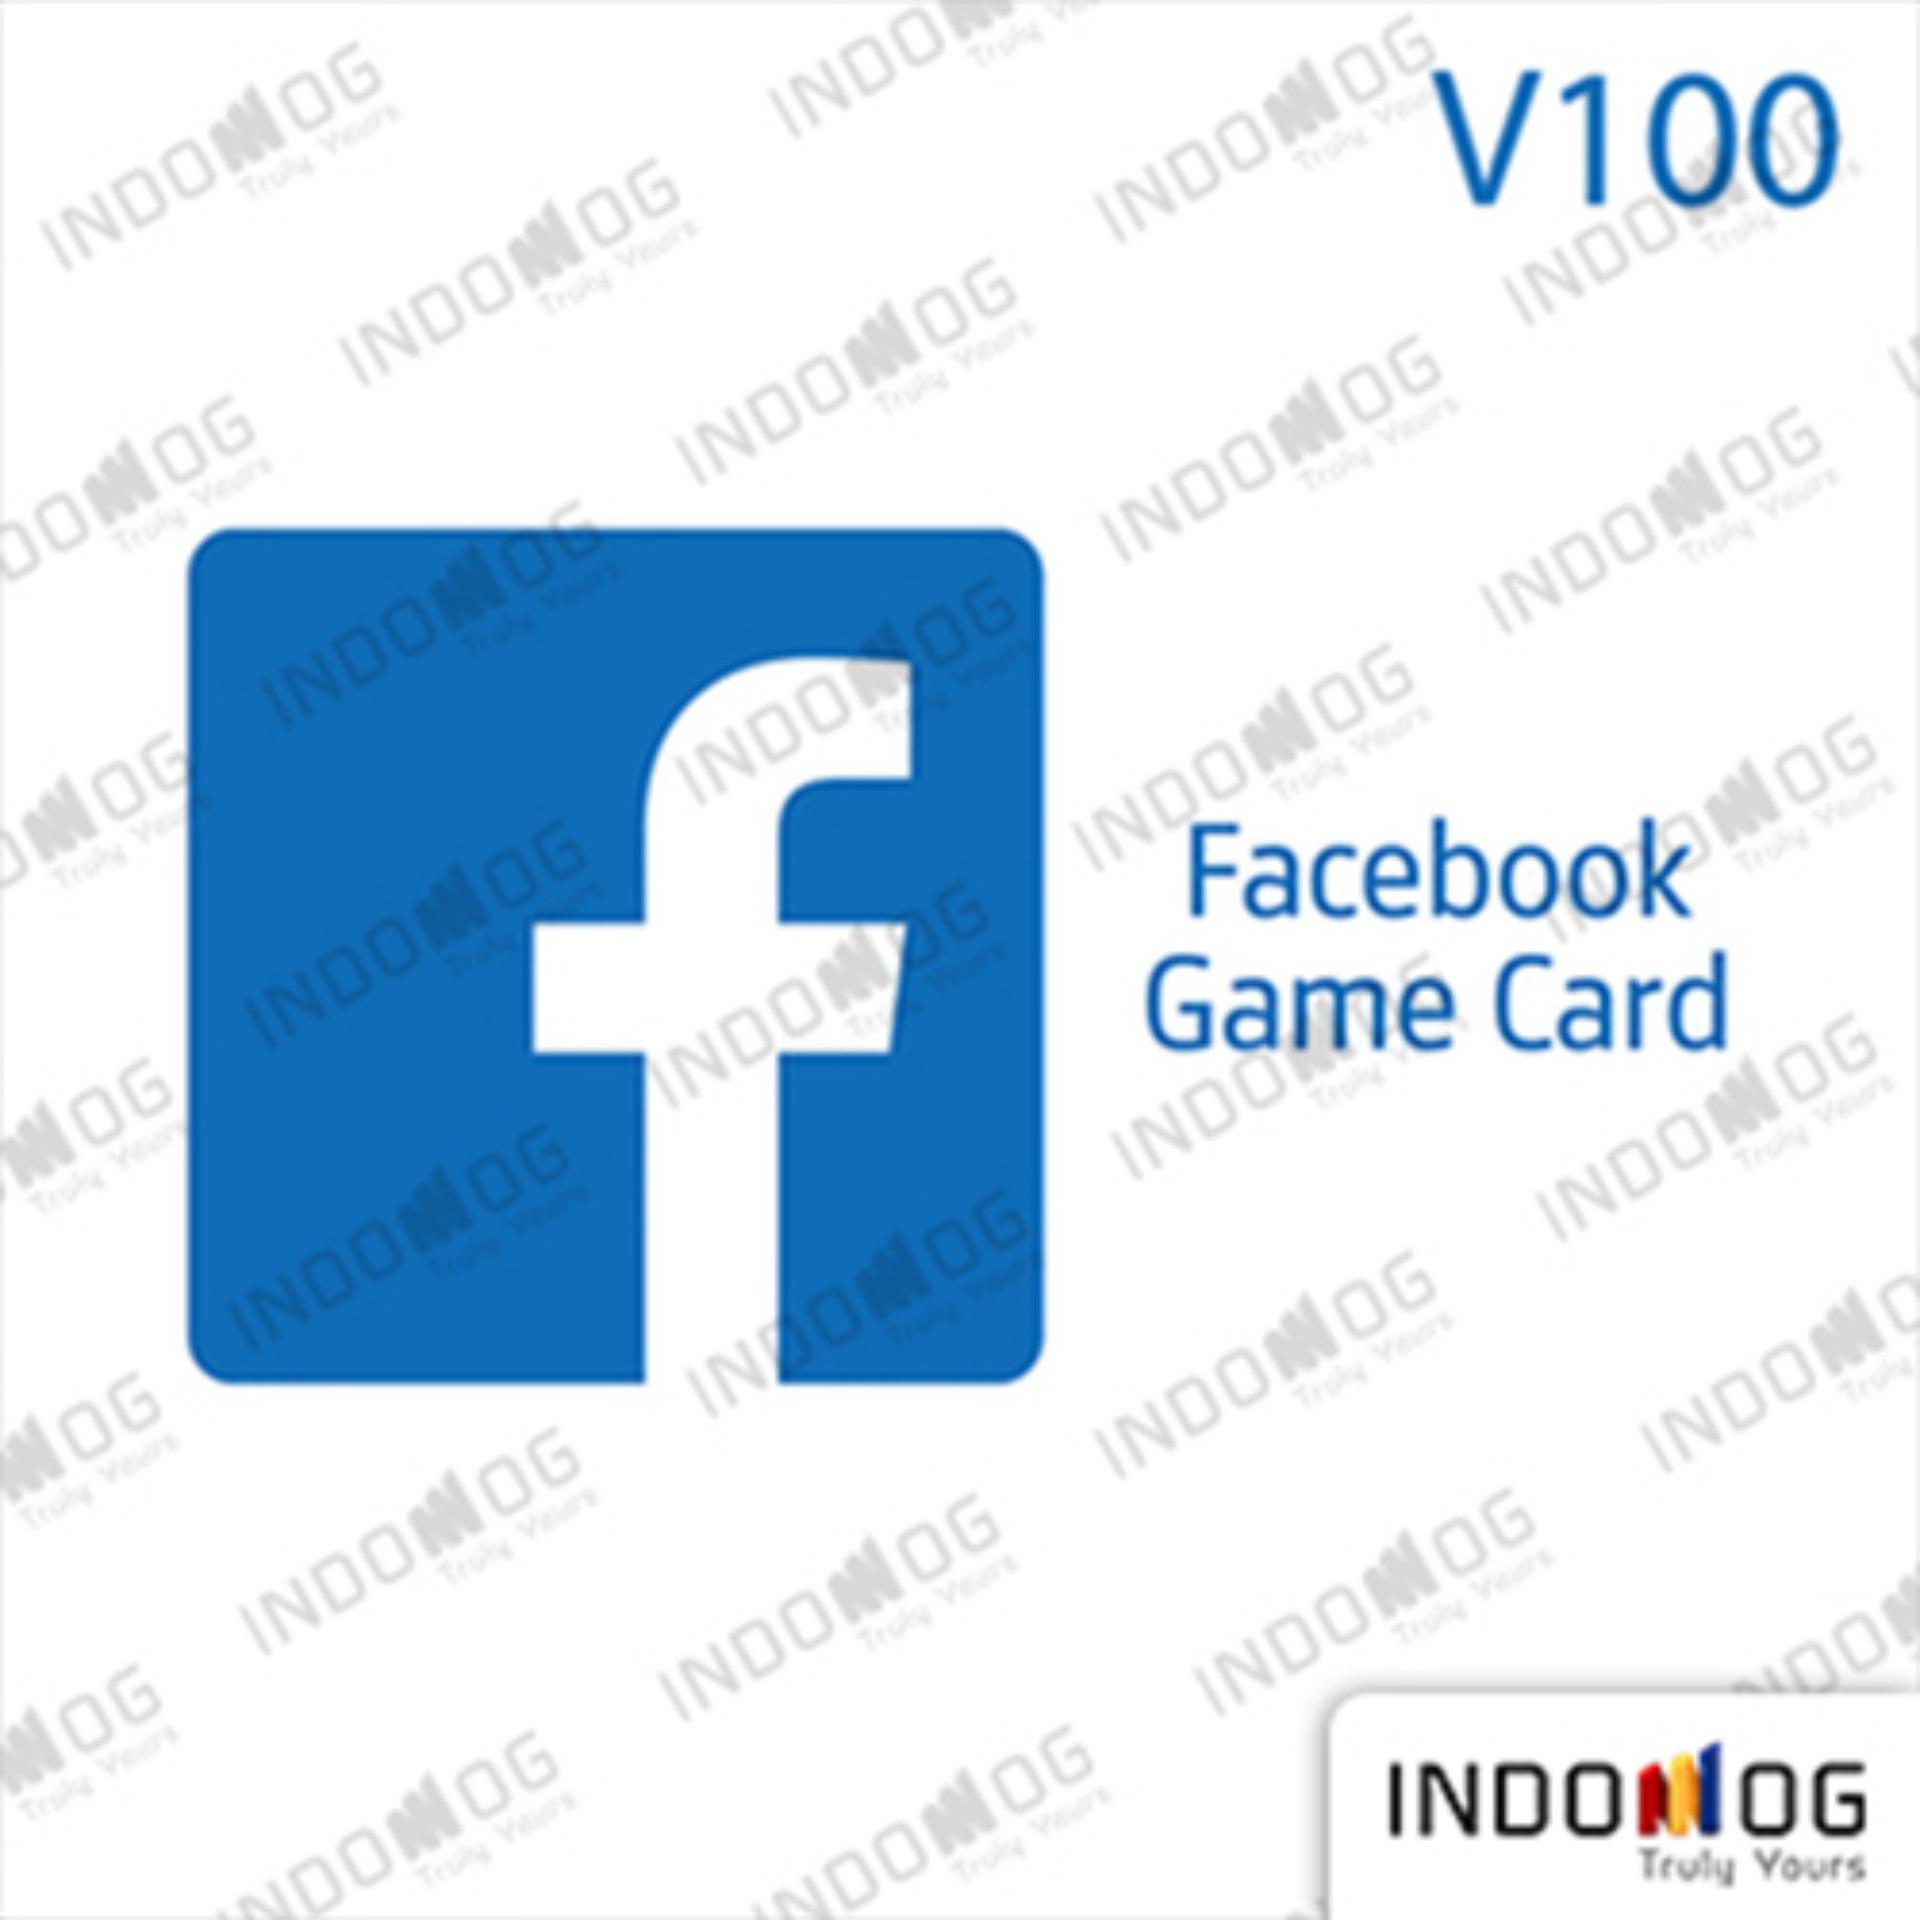 Indomog Mogplay 100000 Daftar Update Harga Terbaru Indonesia Voucher Lyto 20000 Facebook Game Card 100 000